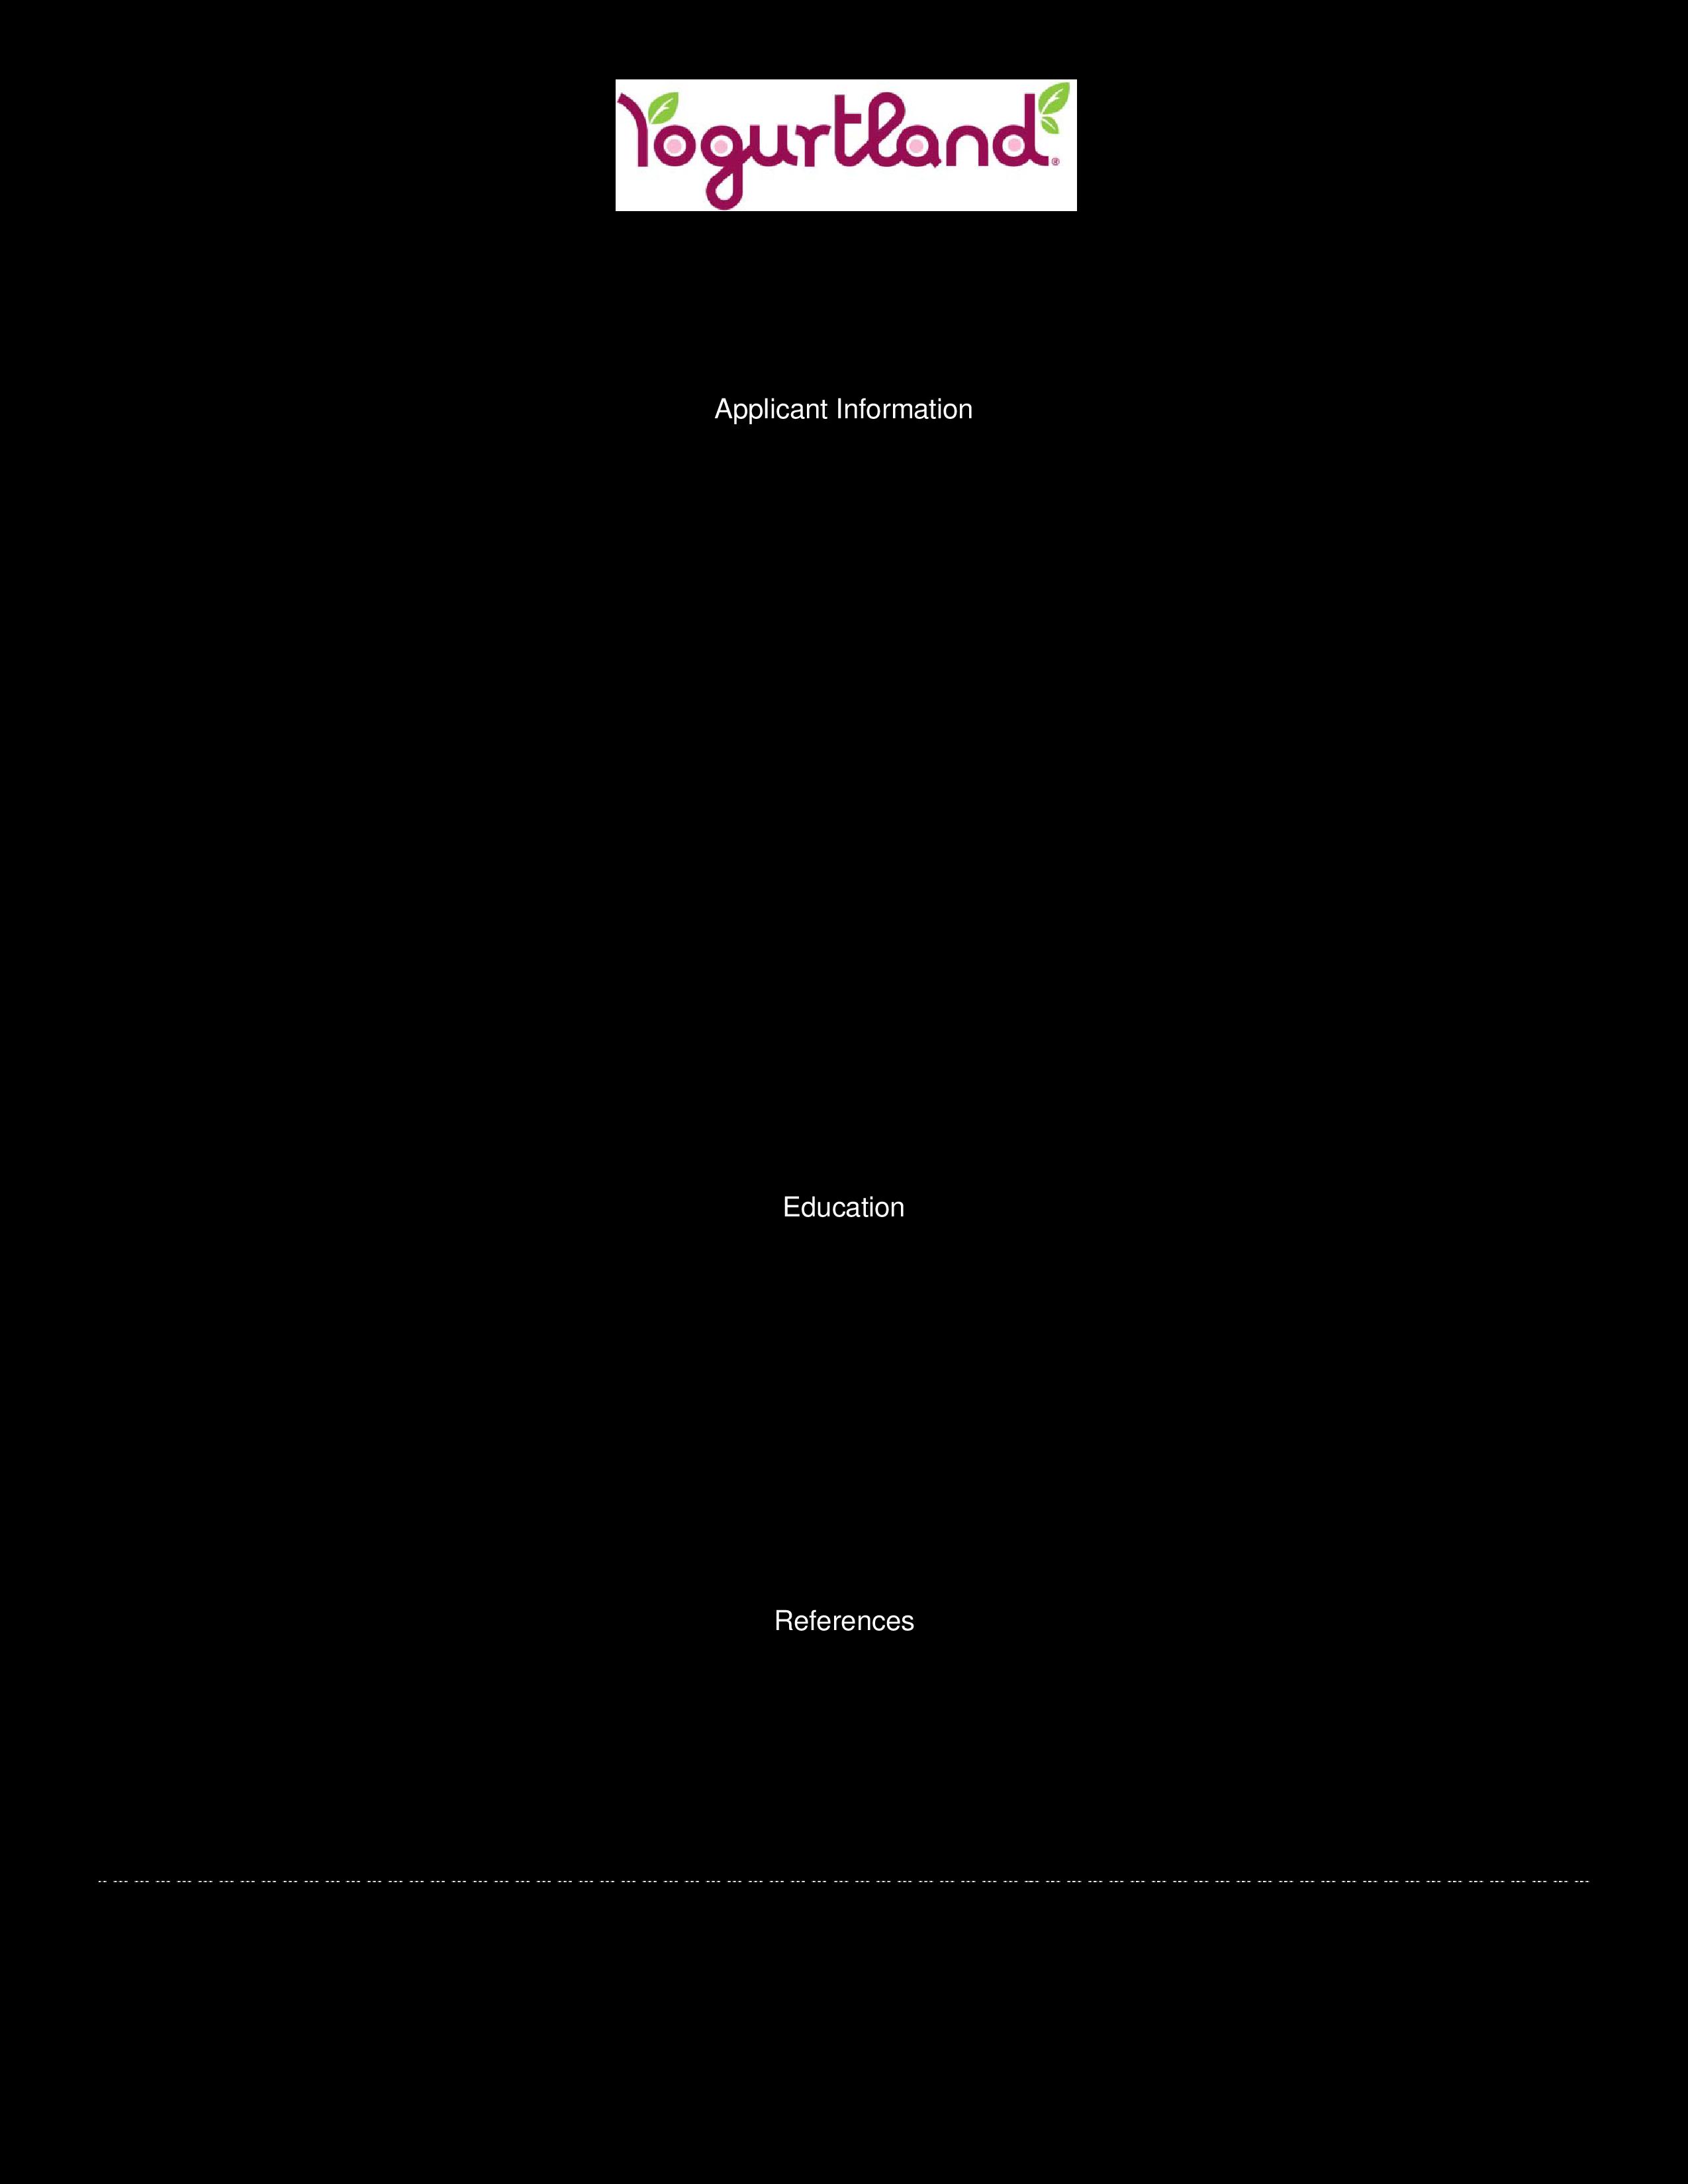 work availability form template